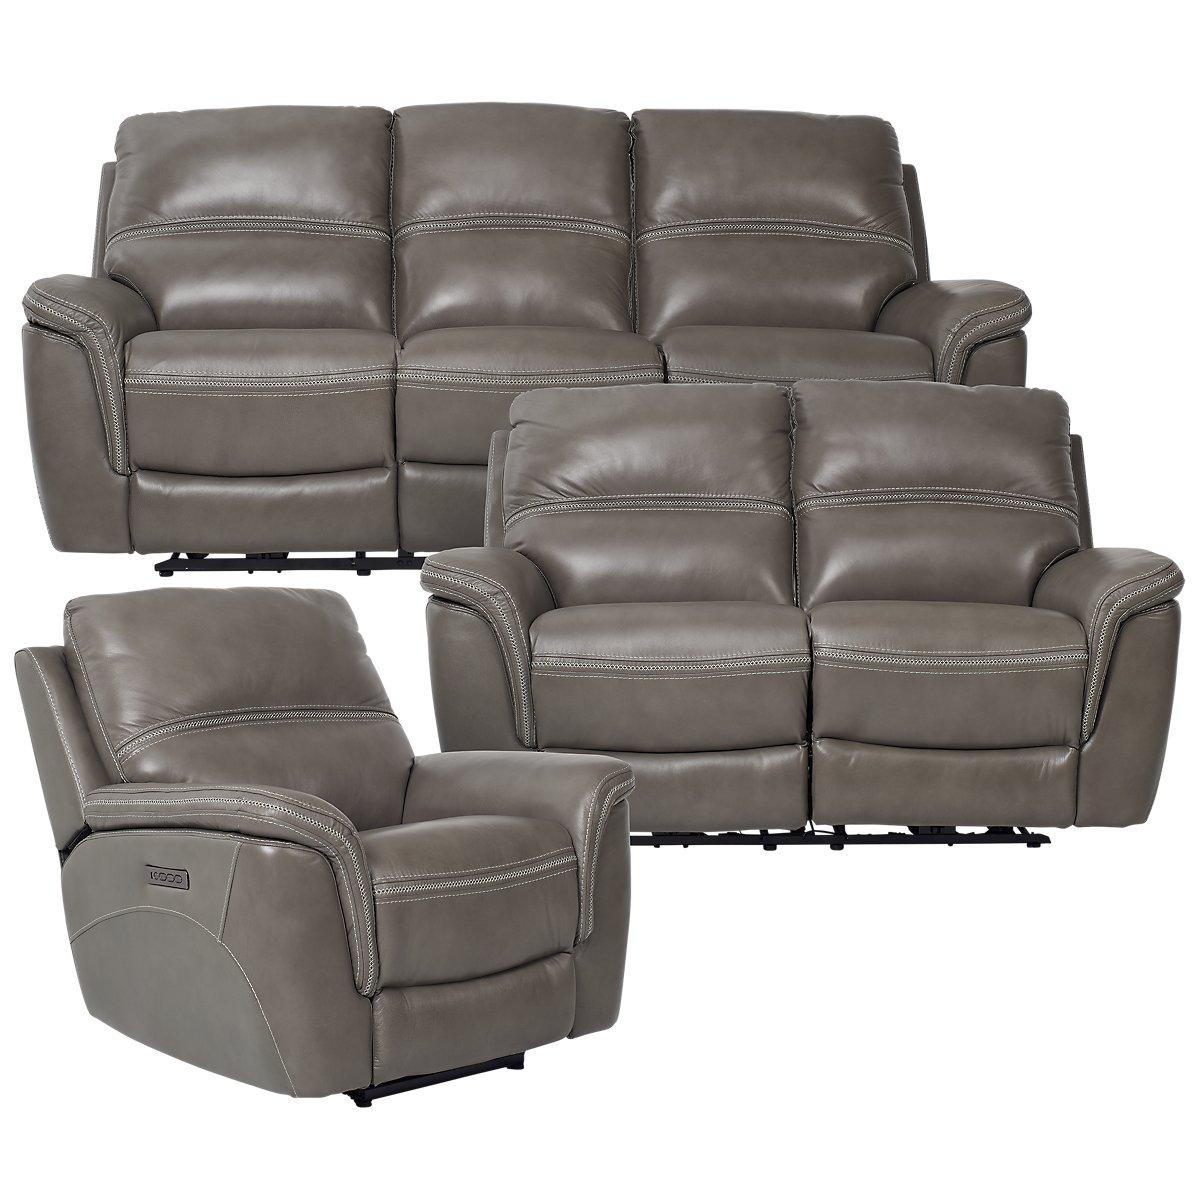 City Furniture Bryson Dark Gray Leather Power Reclining Sofa